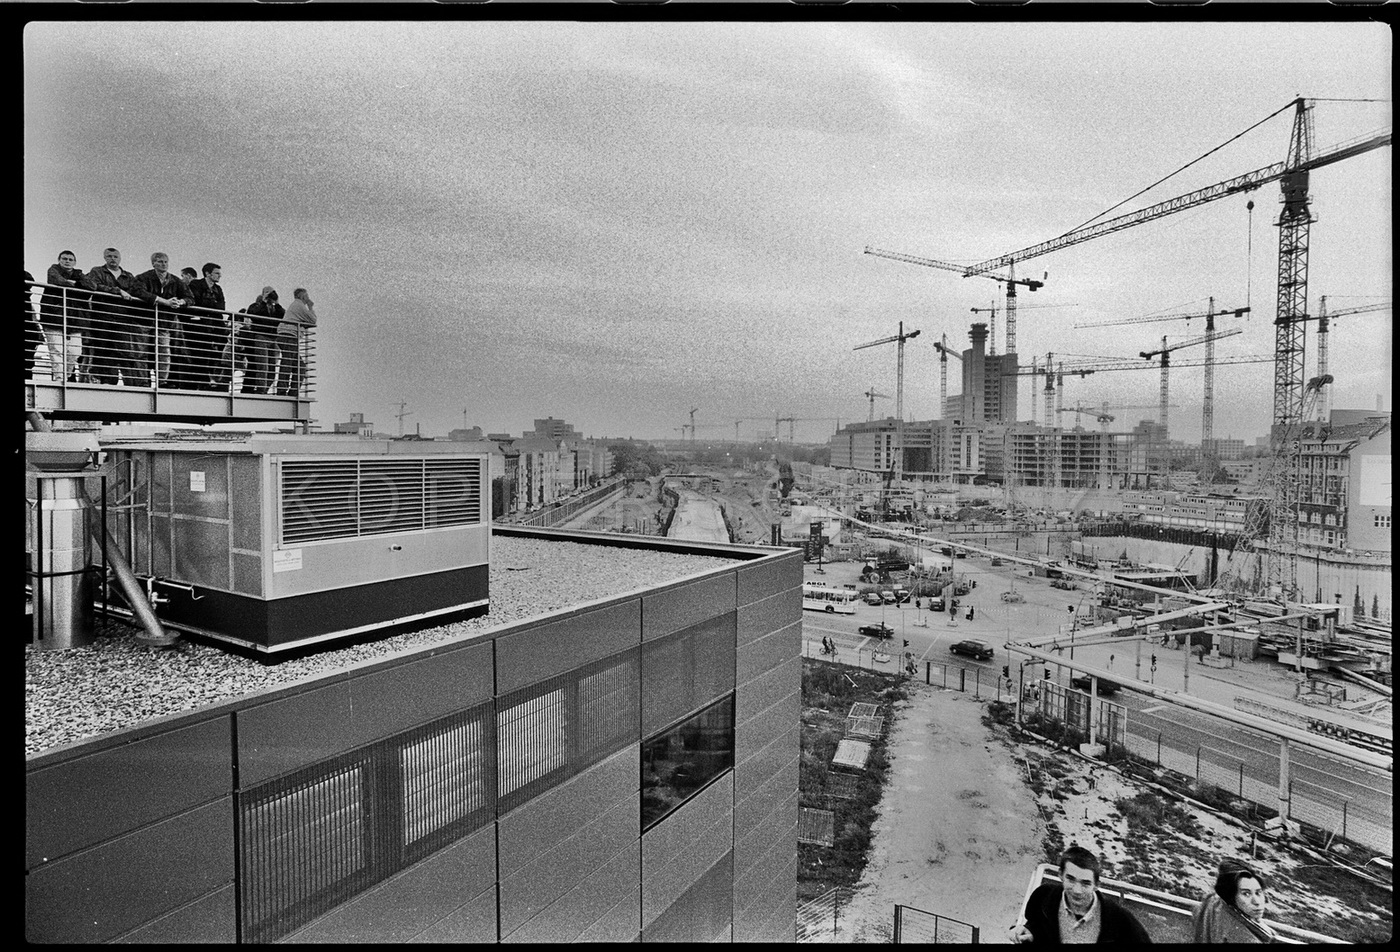 Nr01-043_Infobox-Potzdamer-Platz-12.10.1996